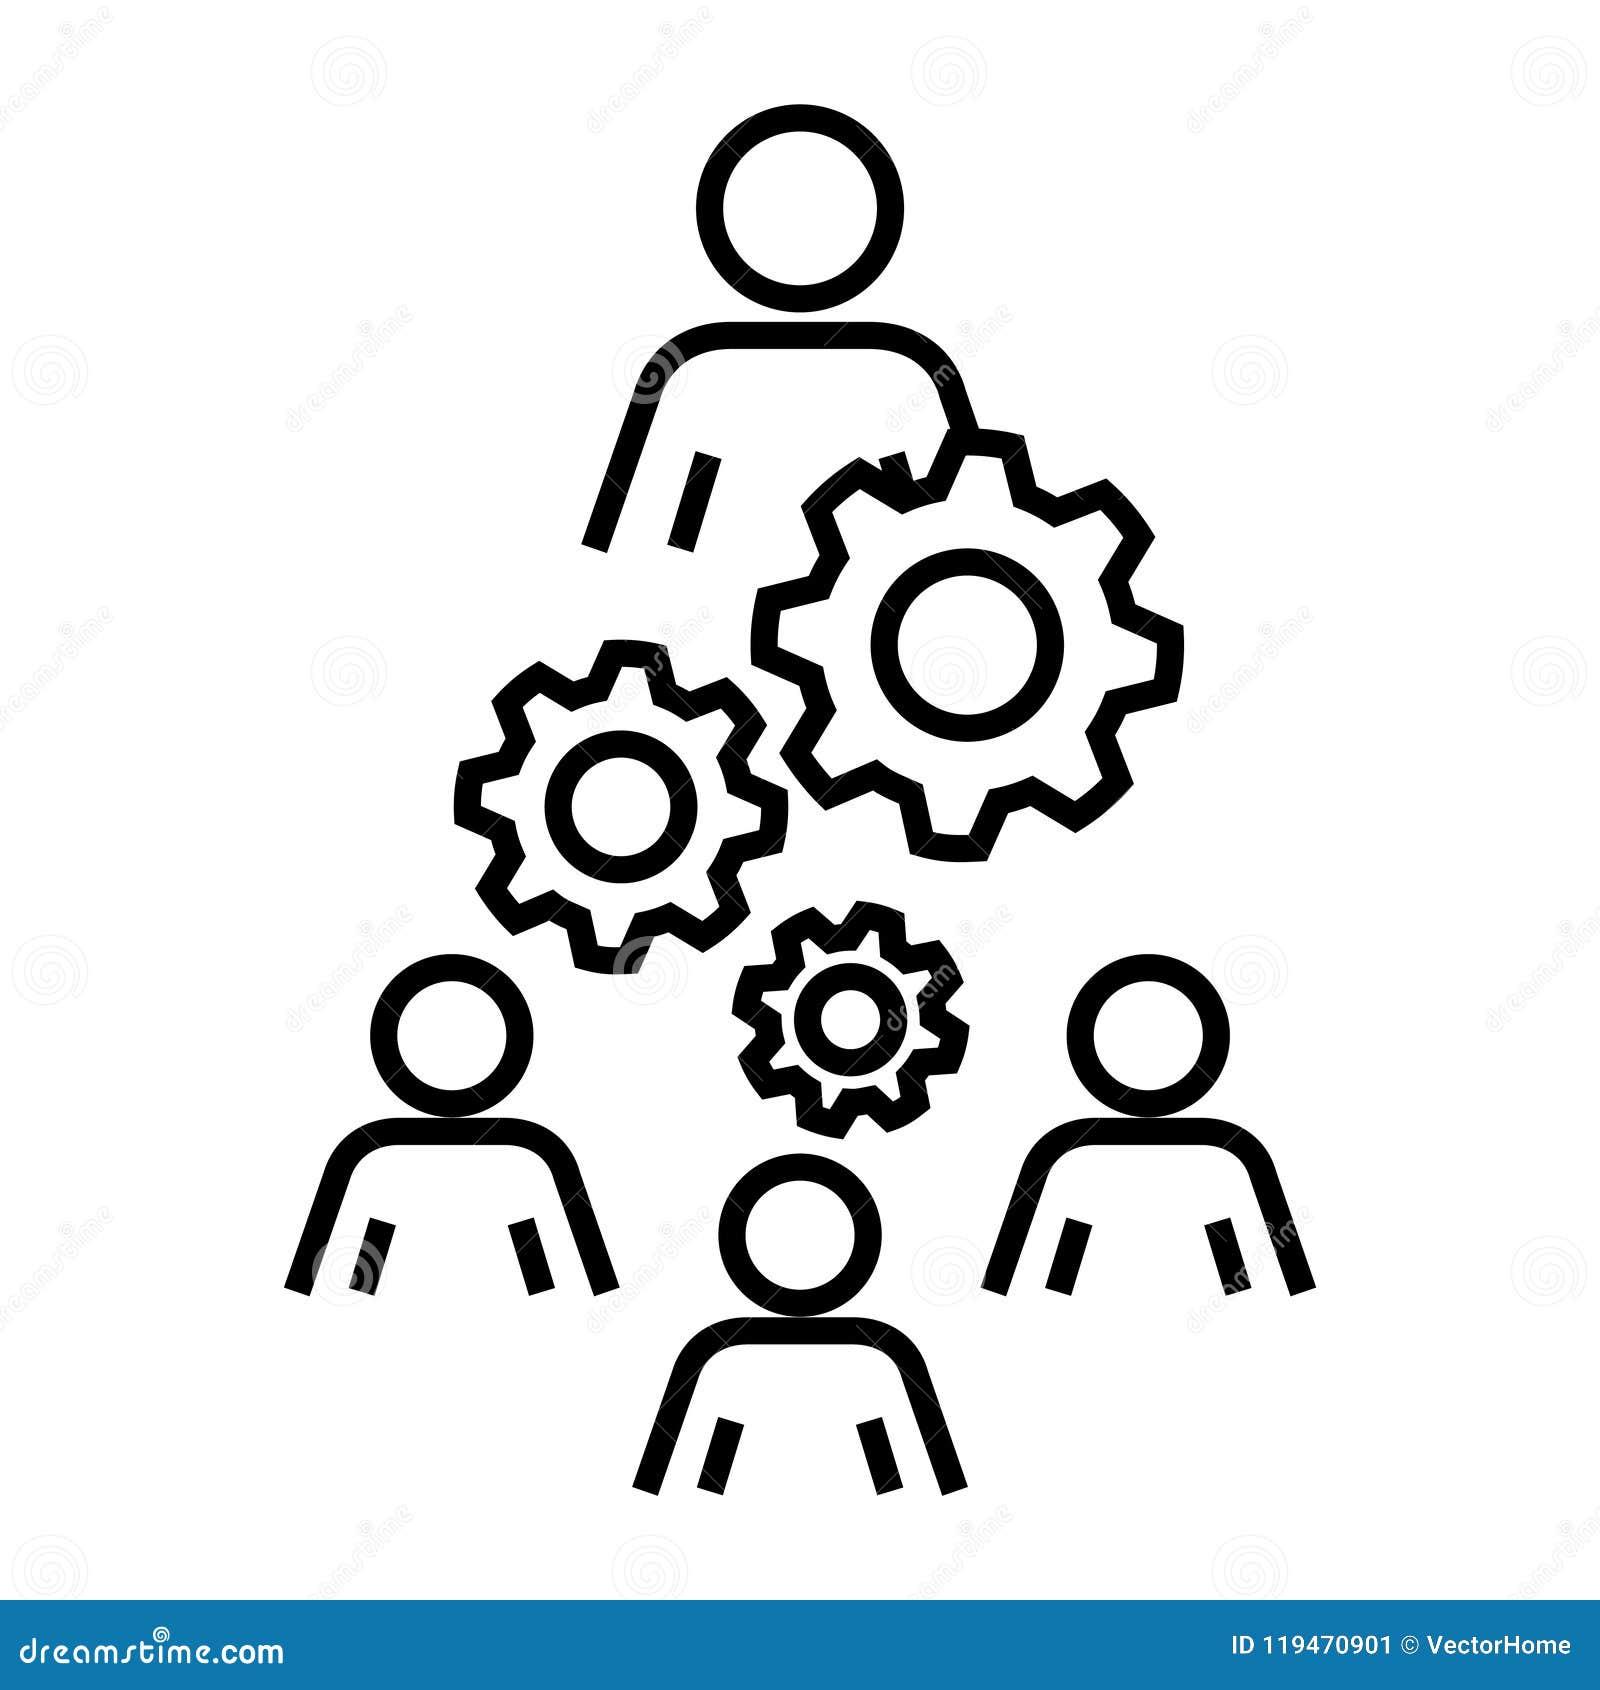 Organisation Stock Illustrations, Vecteurs, & Clipart ...